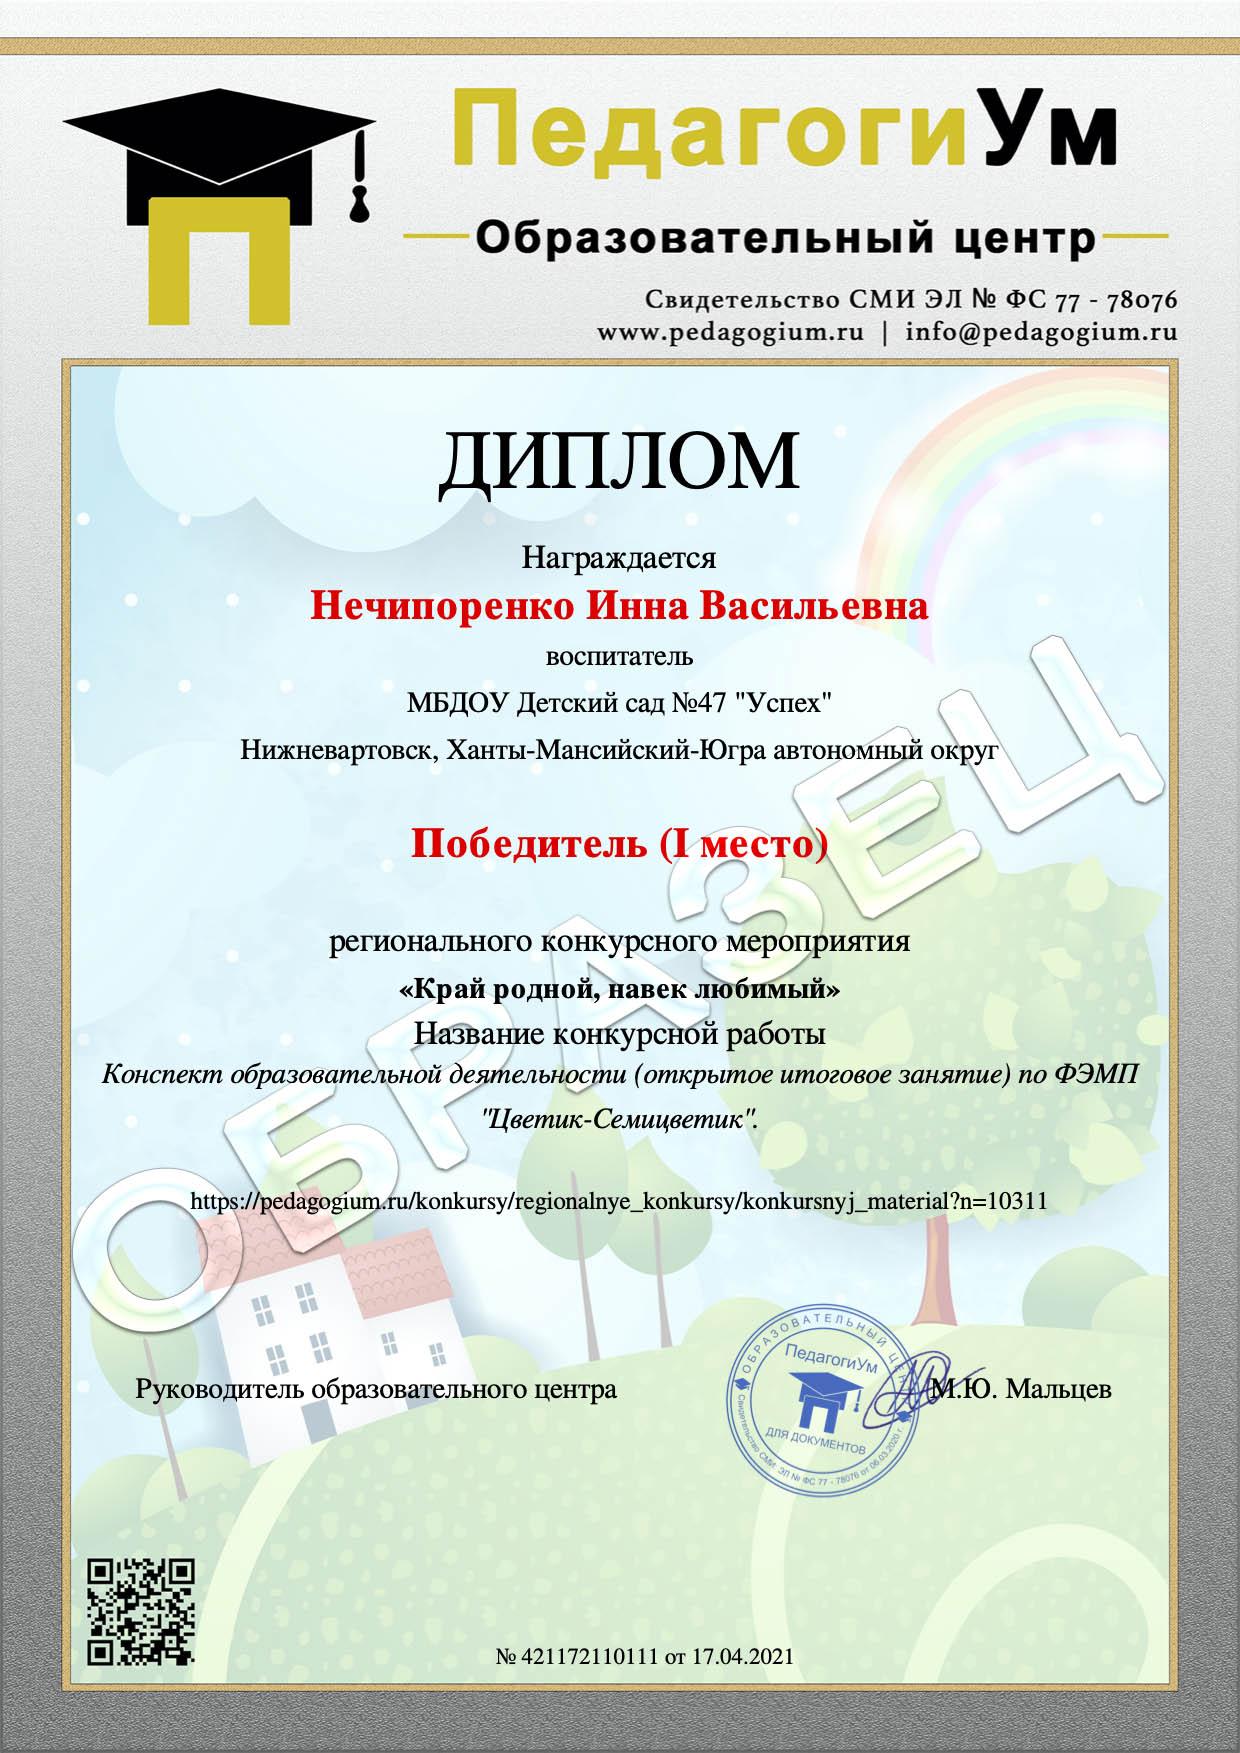 Образец документа педагогу-участнику регионального конкурса центра ПедагогиУм.